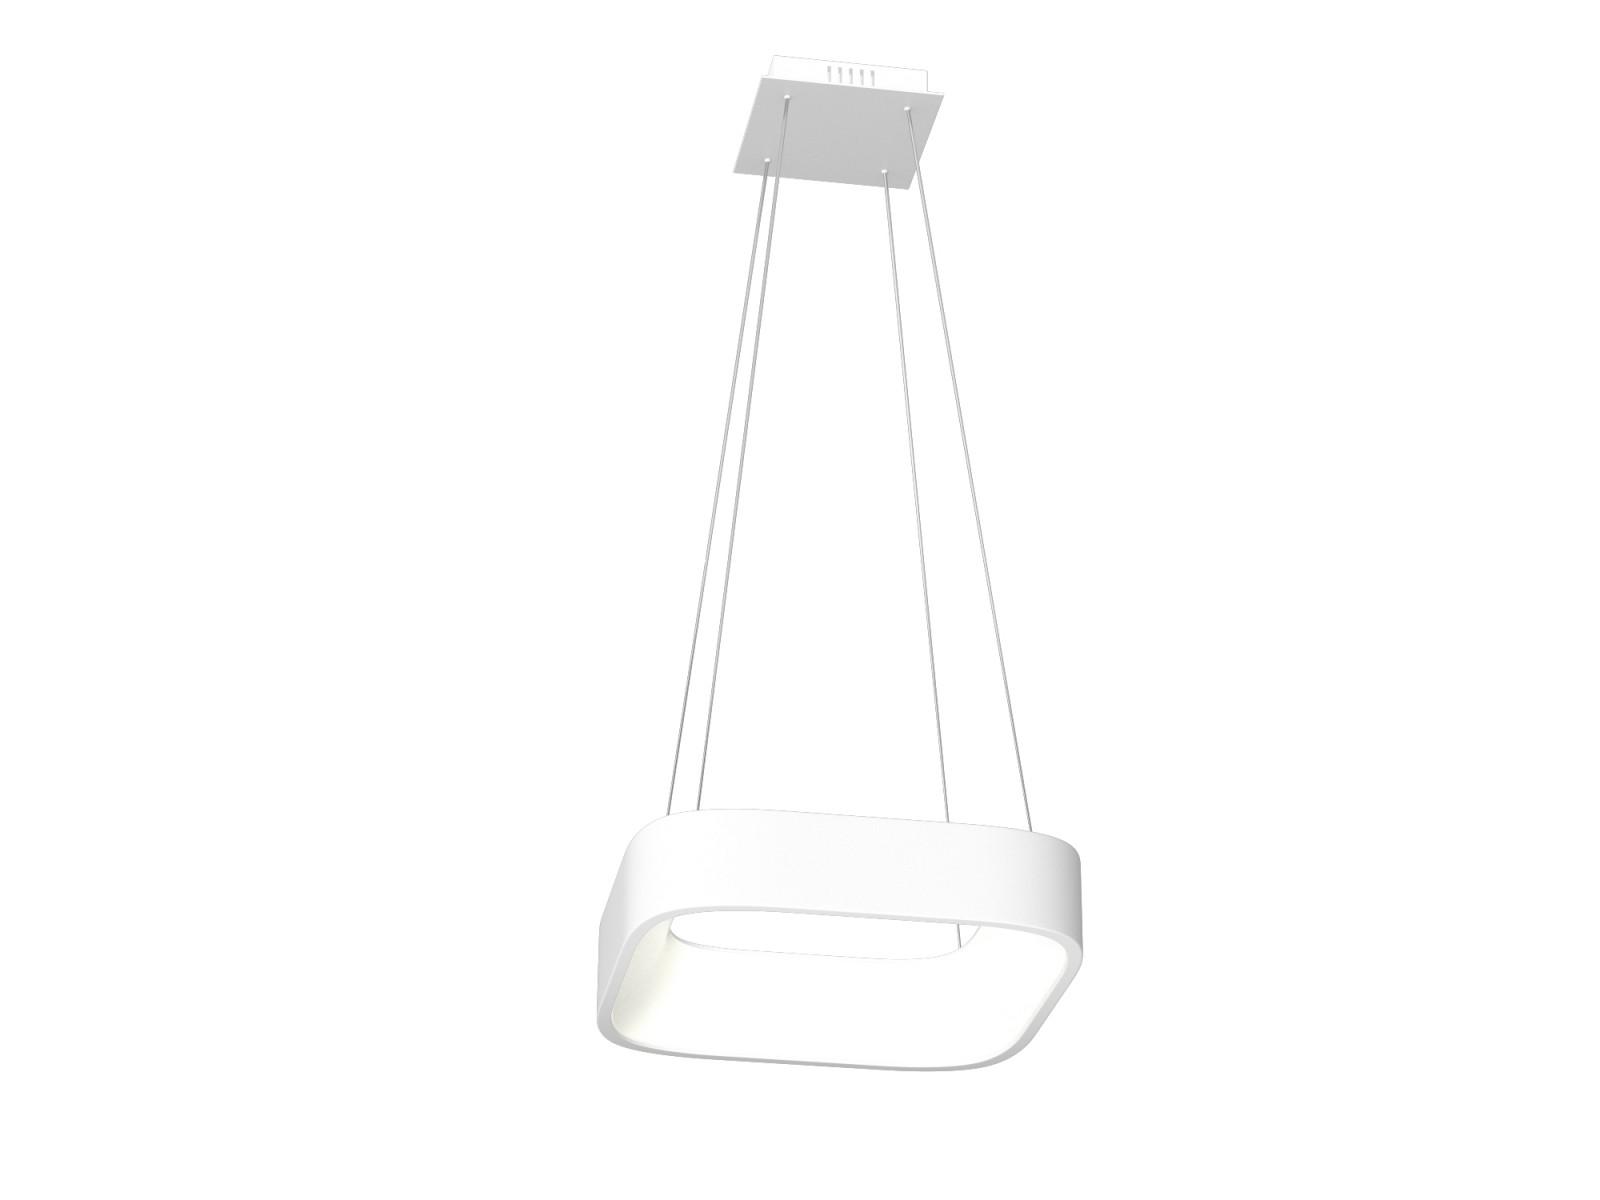 Immax Biele SMART závesné svietidlo hranaté 36W 45cm